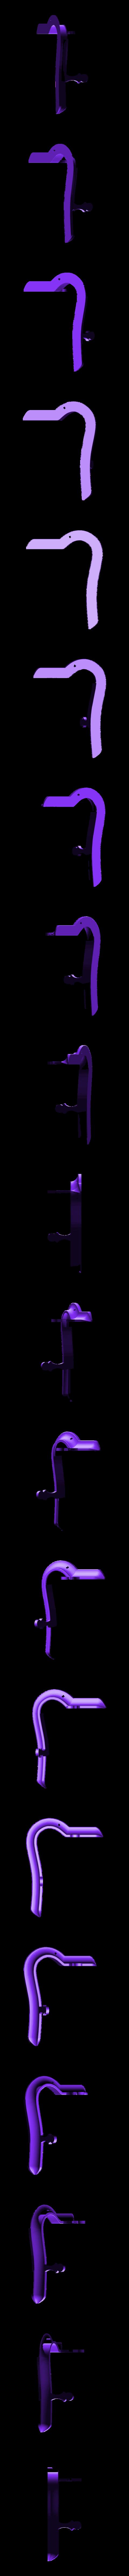 CritterStrap_left.stl Download free STL file Critter Rescue Ramp Modified For Smaller Printer • 3D printer object, MeesterEduard